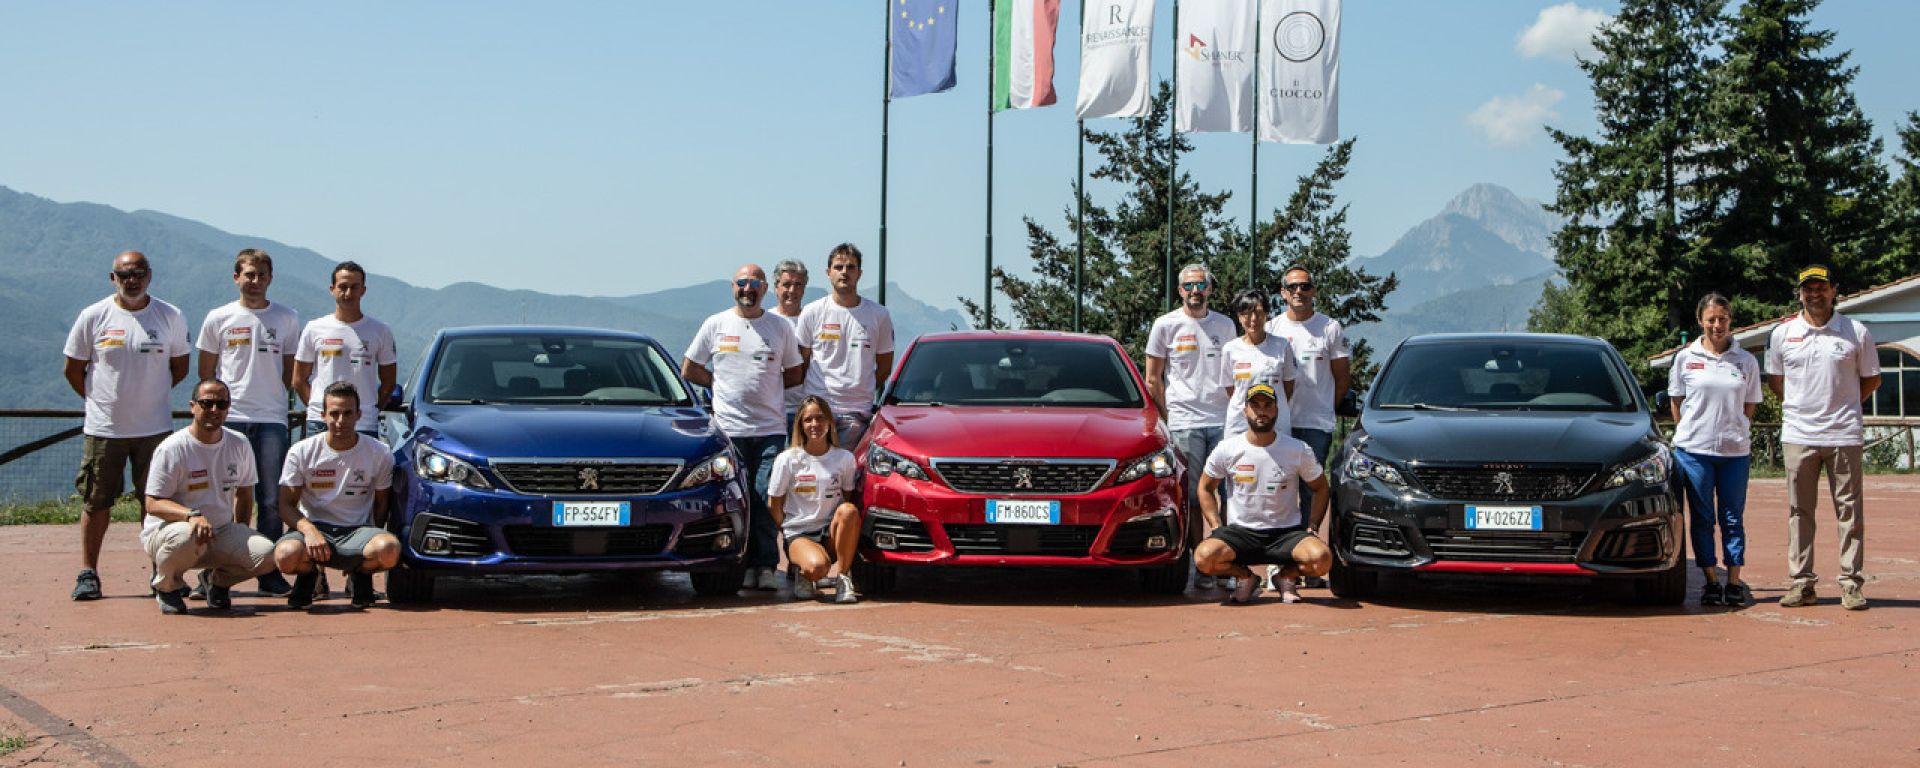 Motorsport Academy Peugeot - Ciocco